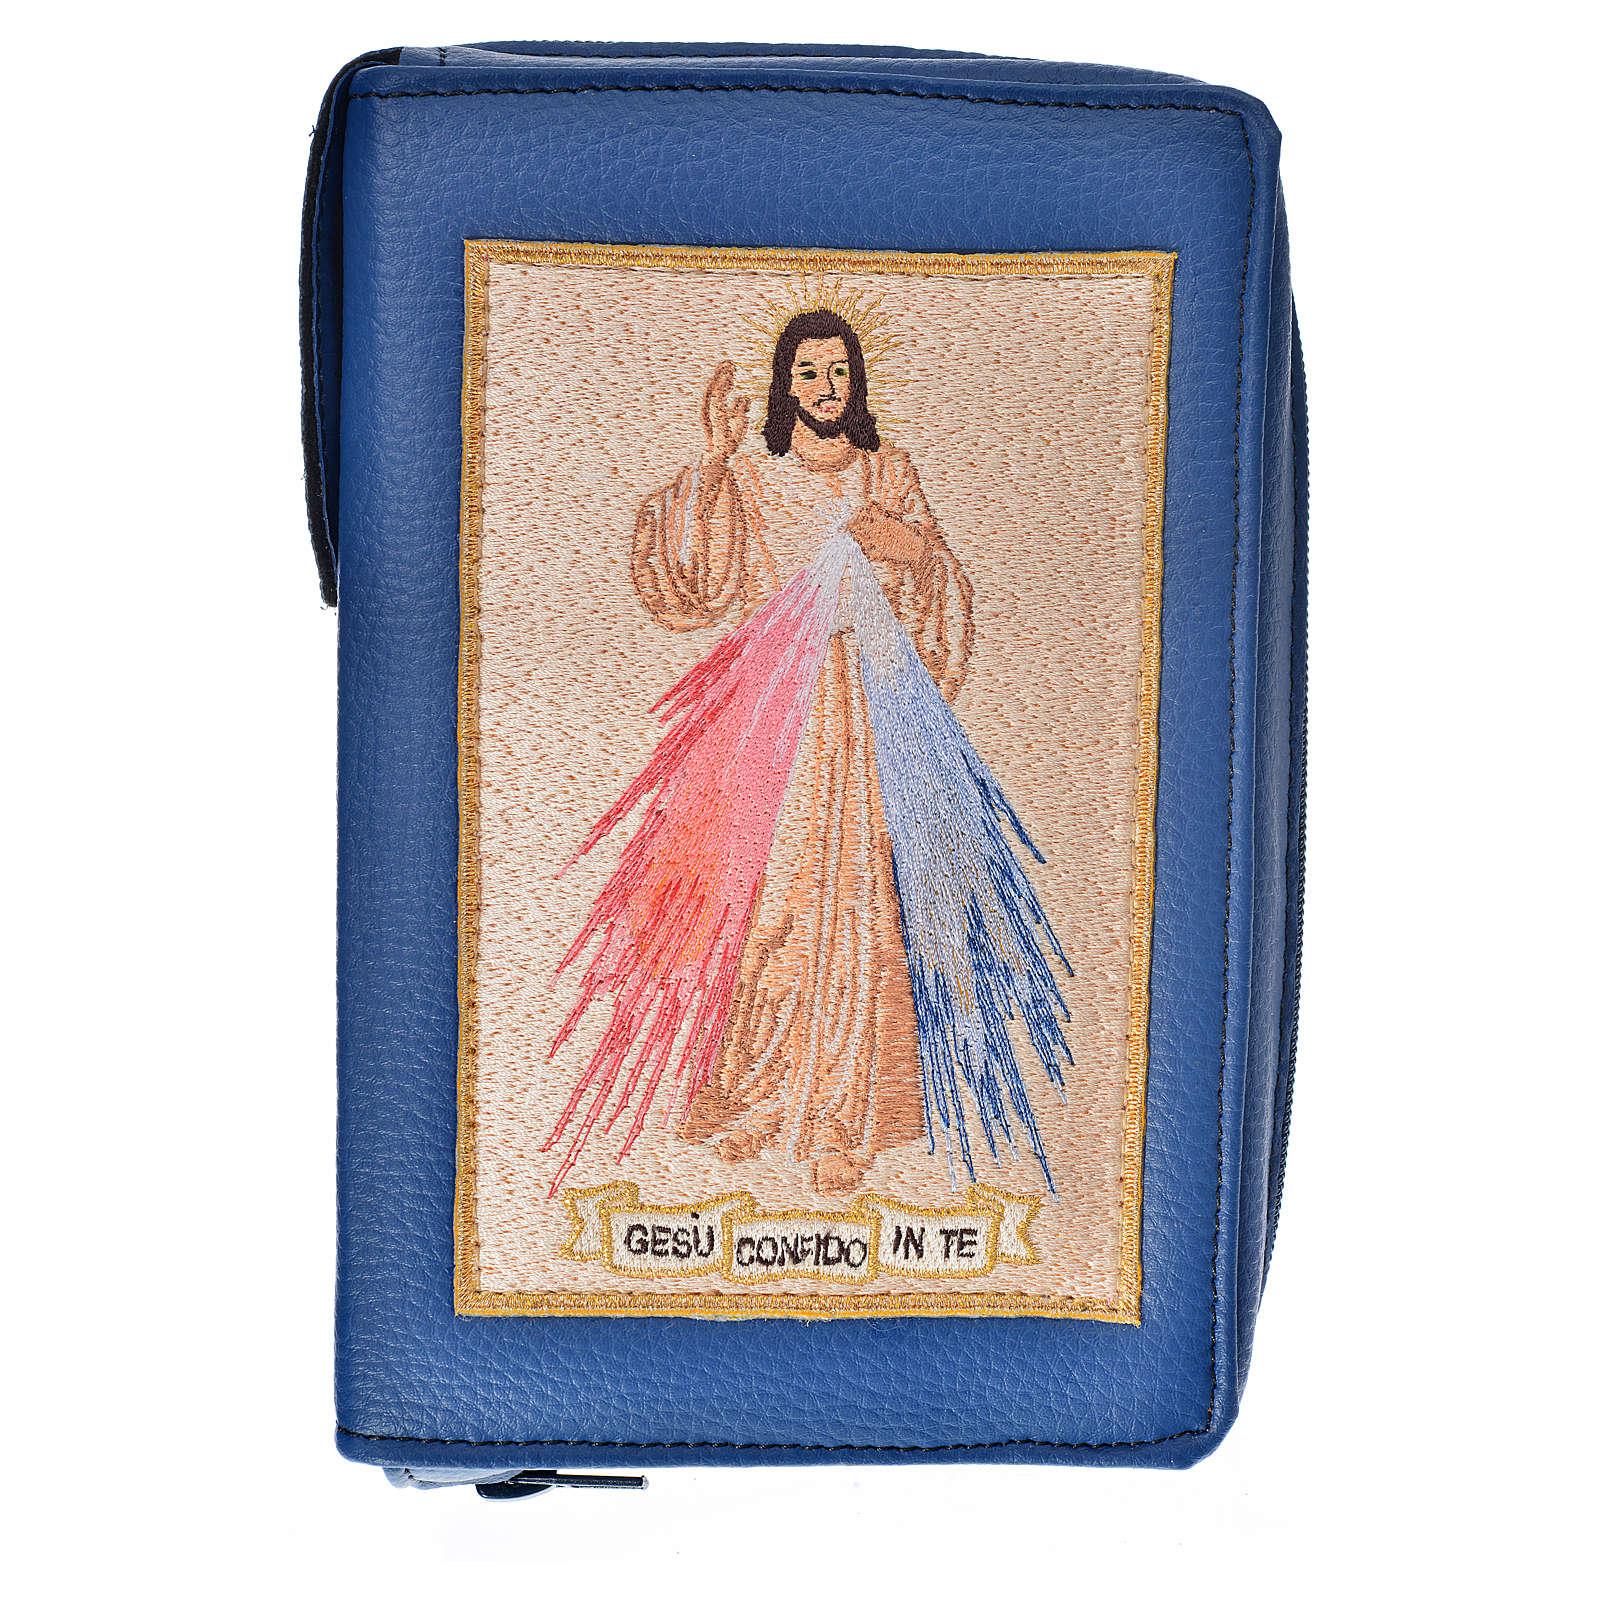 Funda Biblia Jerusalén Nueva Ed. azul simil cuero Divina Misericordia 4